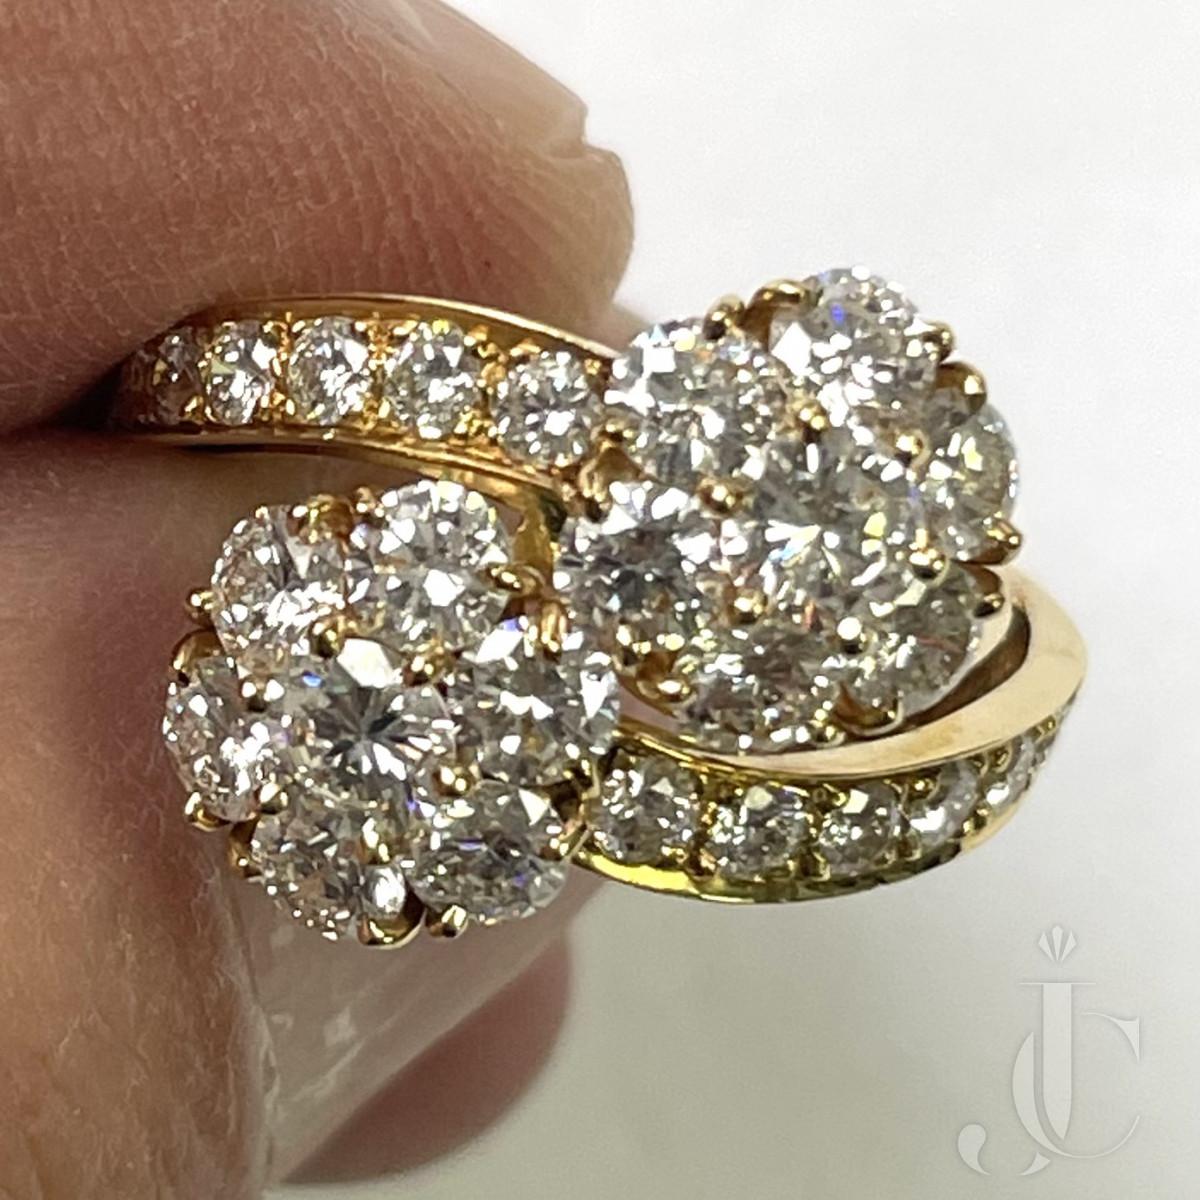 Gorgeous Van Cleef and Arpels Double Fleurette Diamond Ring